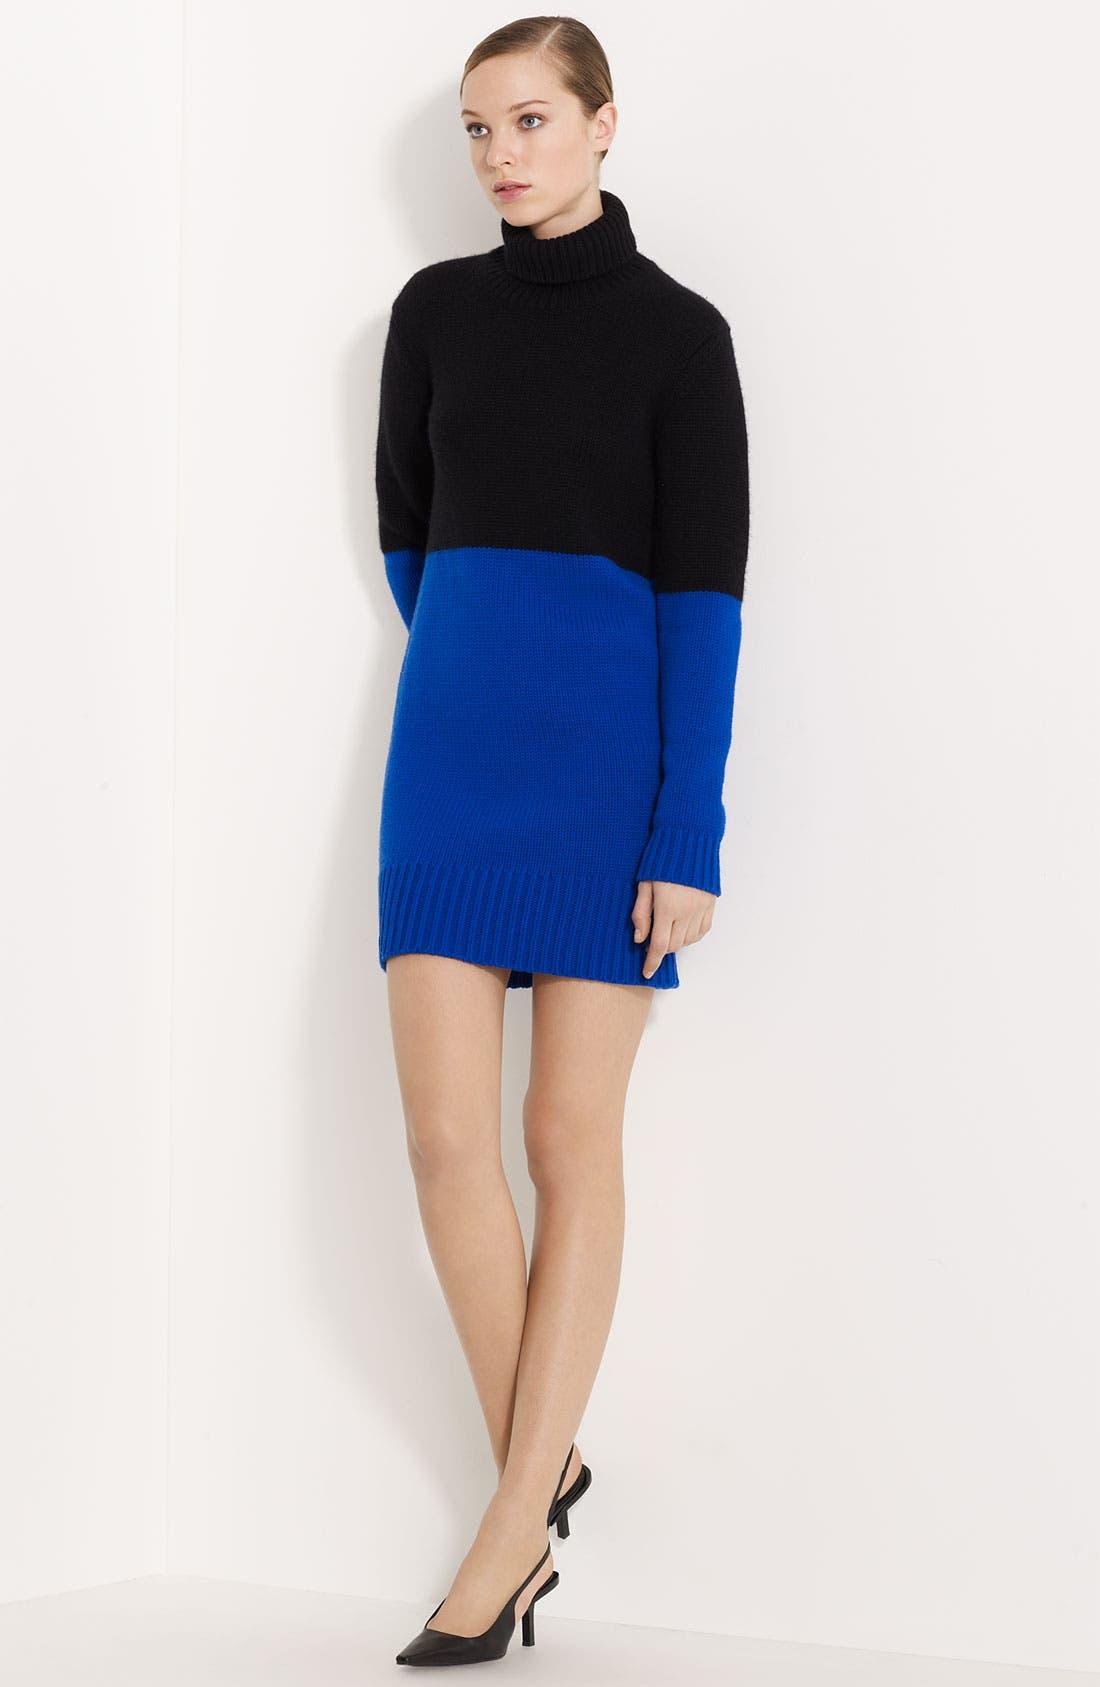 Alternate Image 1 Selected - Michael Kors Colorblocked Cashmere Dress